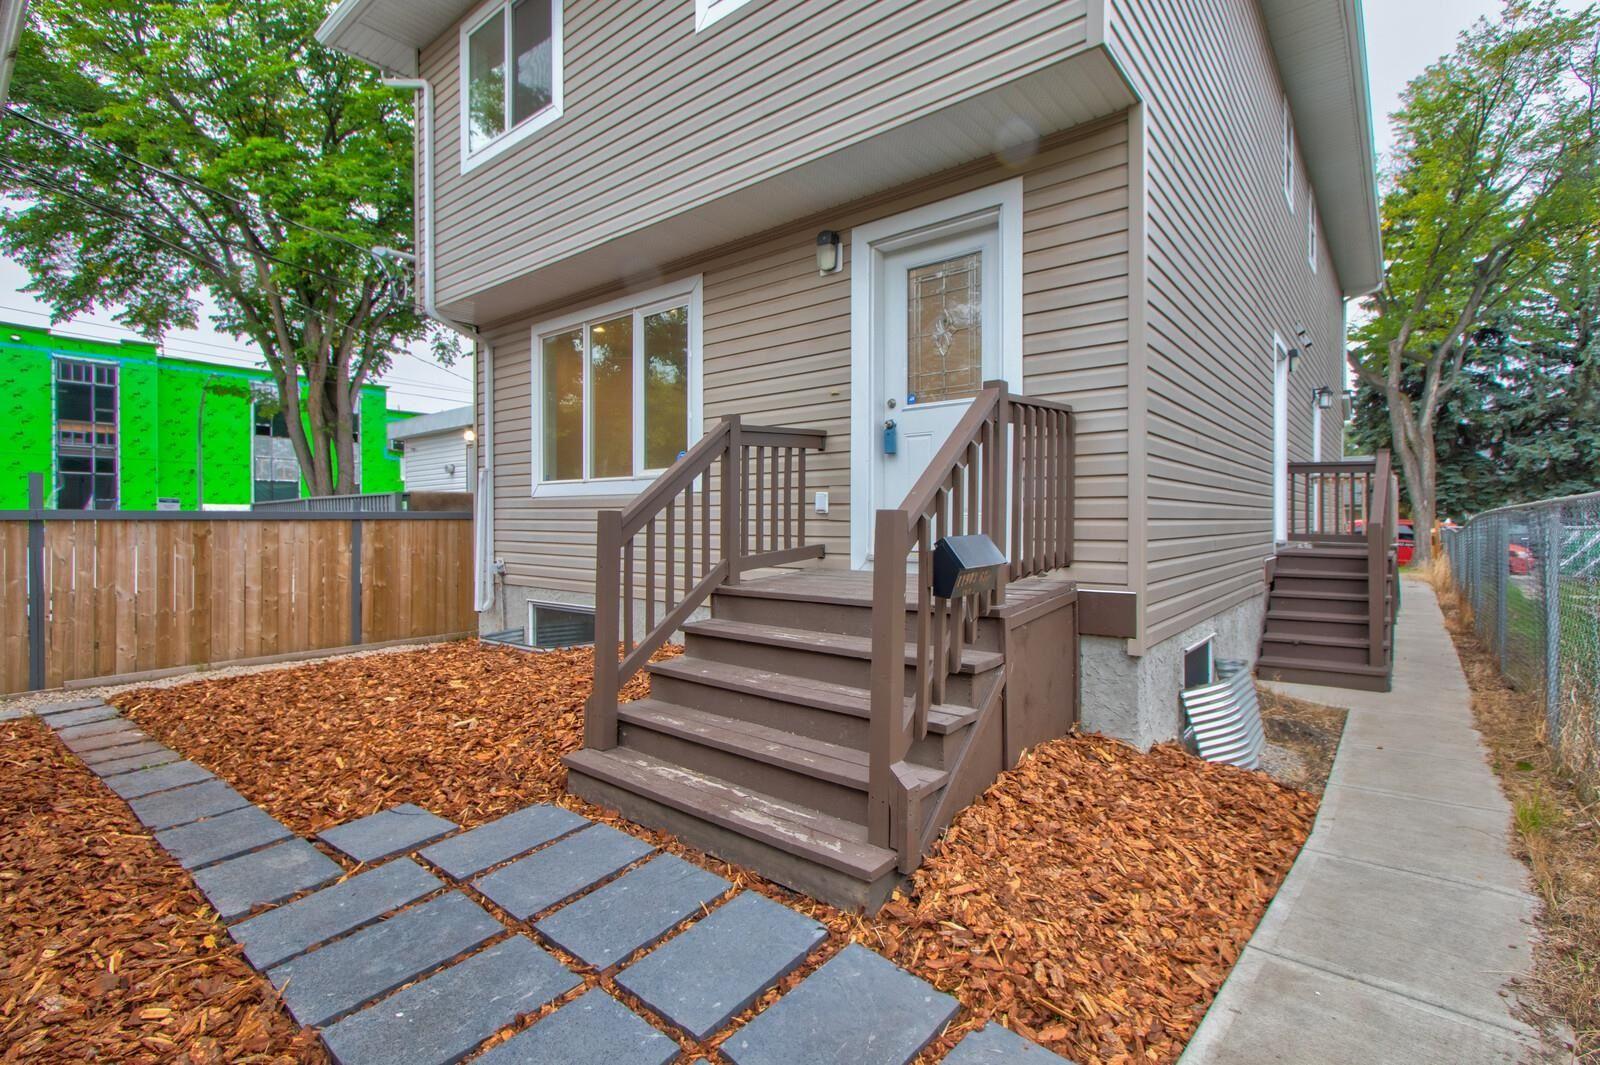 Main Photo: 2 11903 63 Street in Edmonton: Zone 06 House Half Duplex for sale : MLS®# E4261189